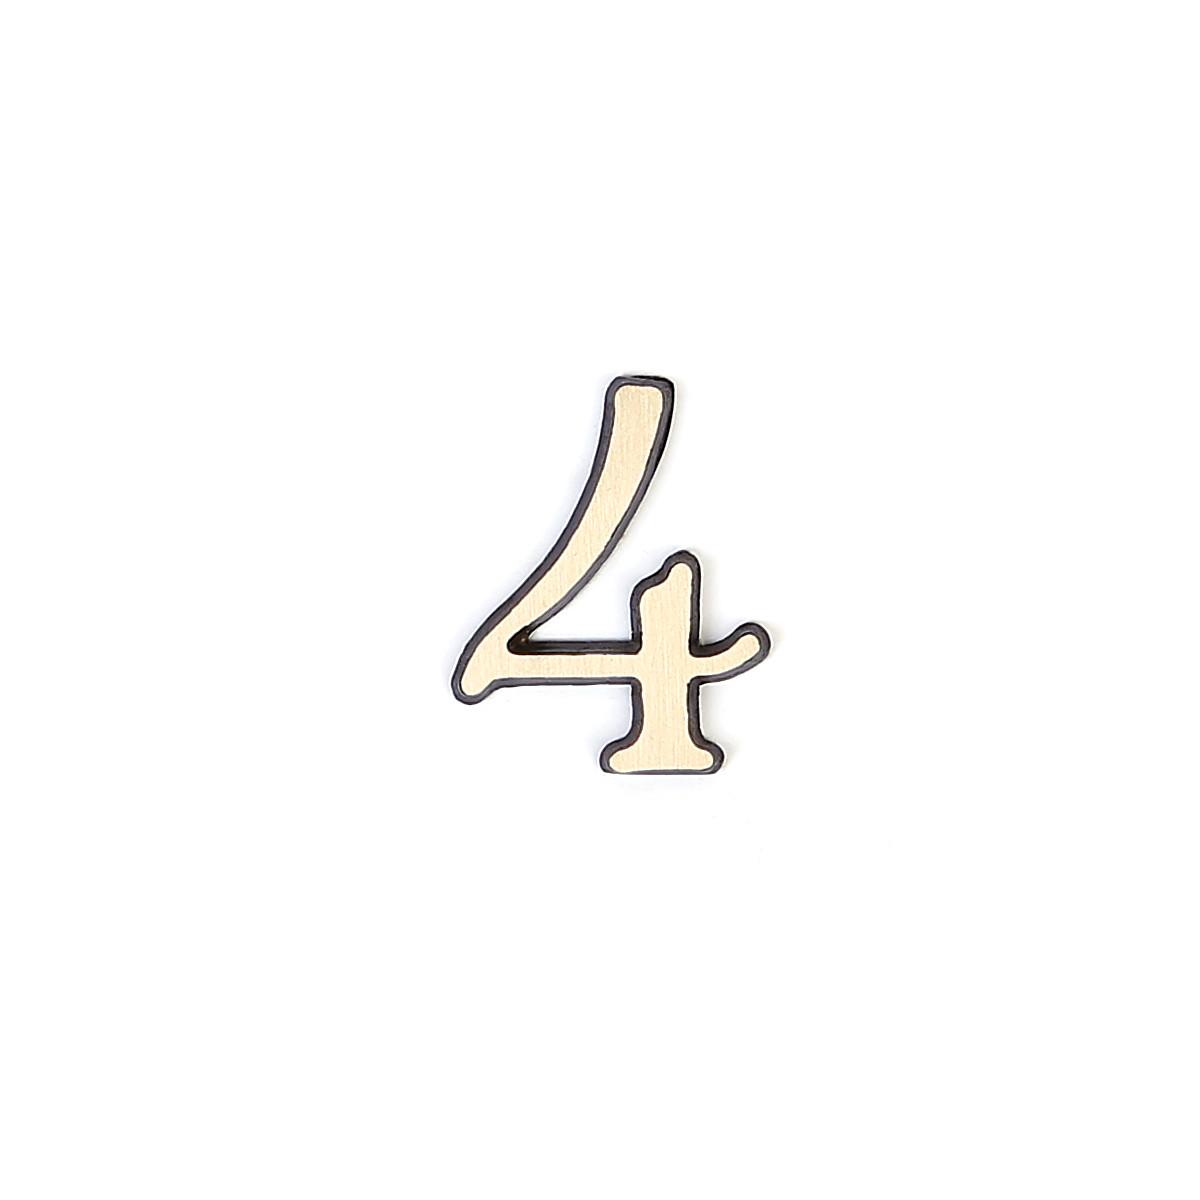 Номер на дверь Larvij цифра 4 антик бронза. Номер из латуни (LNB5 AB#4)